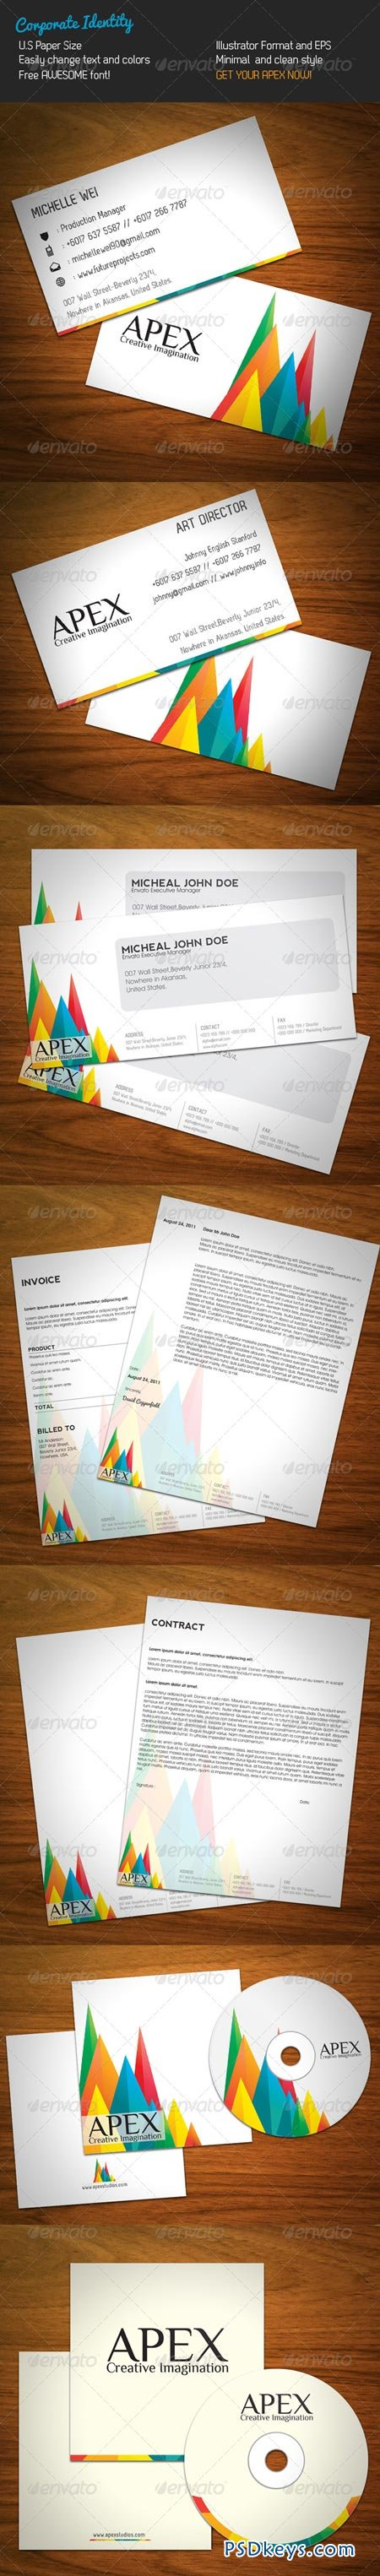 Apex Corporate Identity 242068